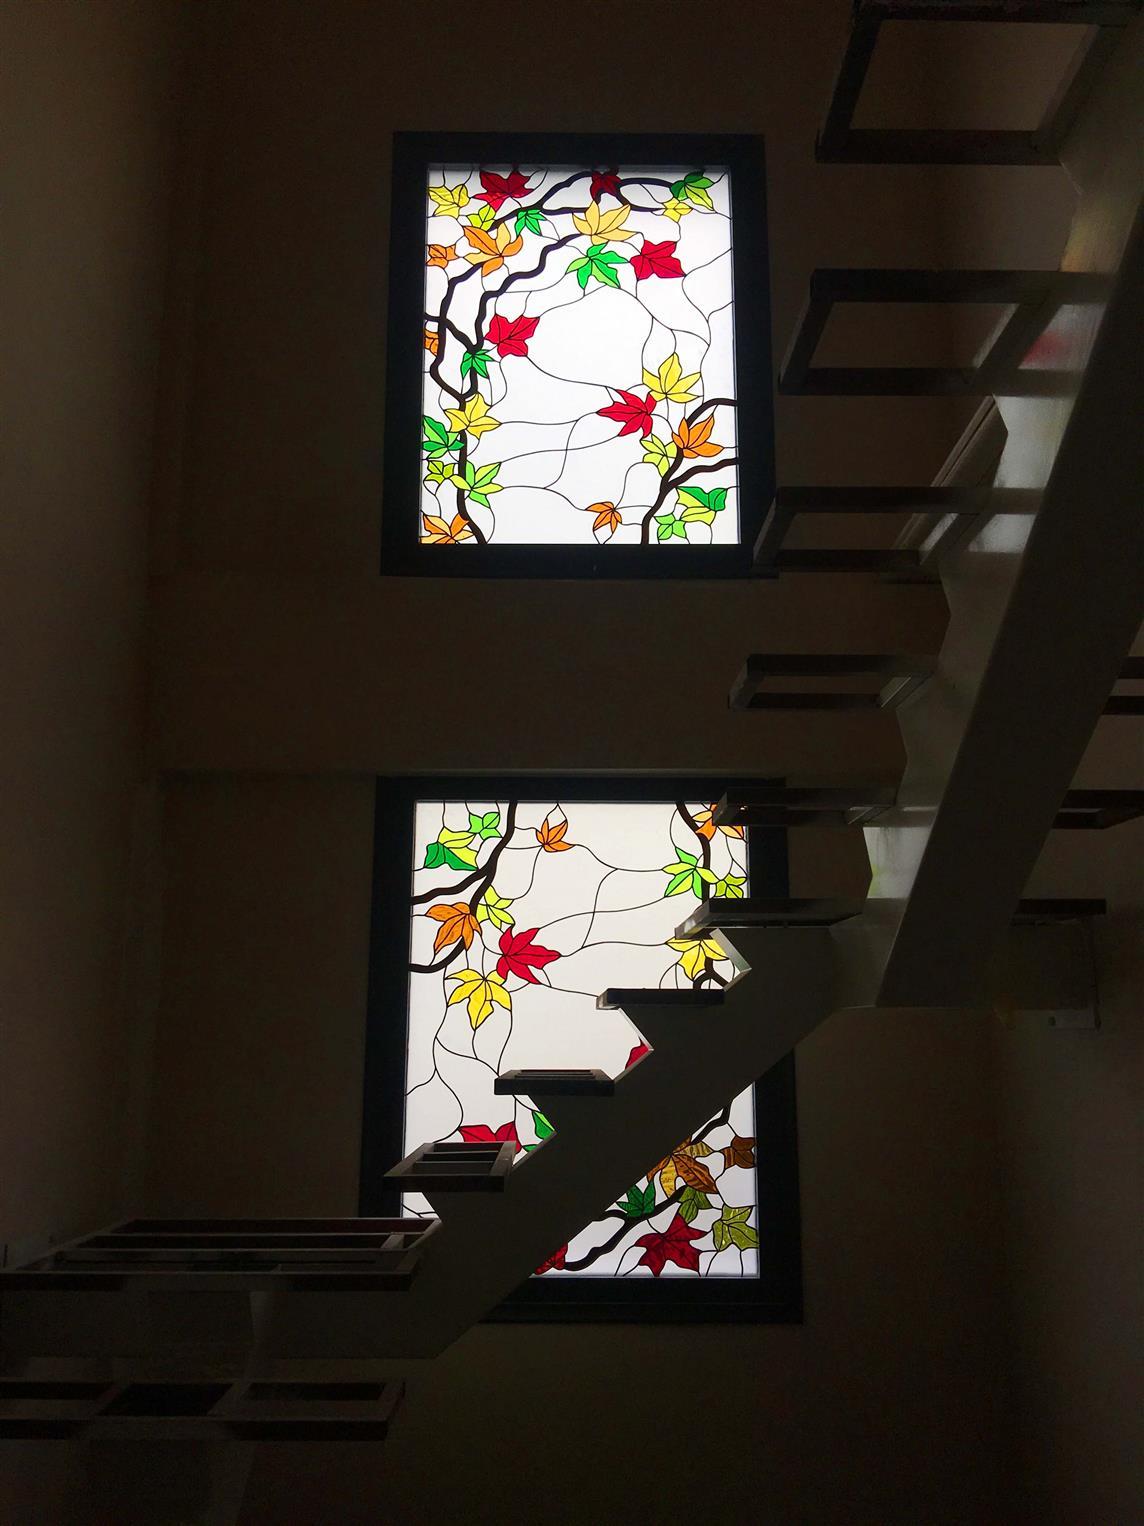 odemis-villa202012019554832.jpg izmir vitray çalışması